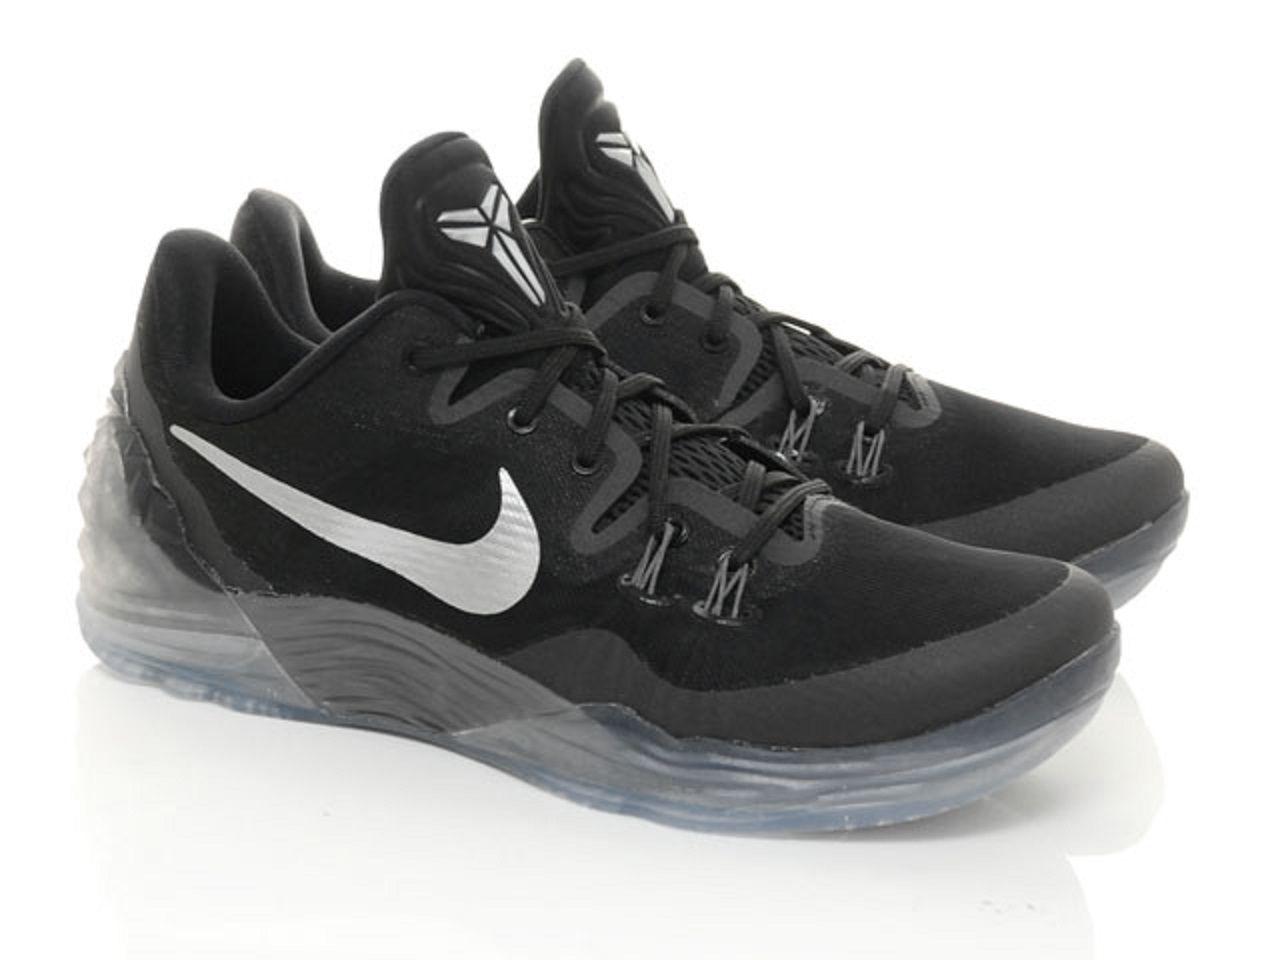 f123feff6c5 Nike Zoom Kobe Venomenon 5 EP Limit Black Basketball Shoes - Buy ...